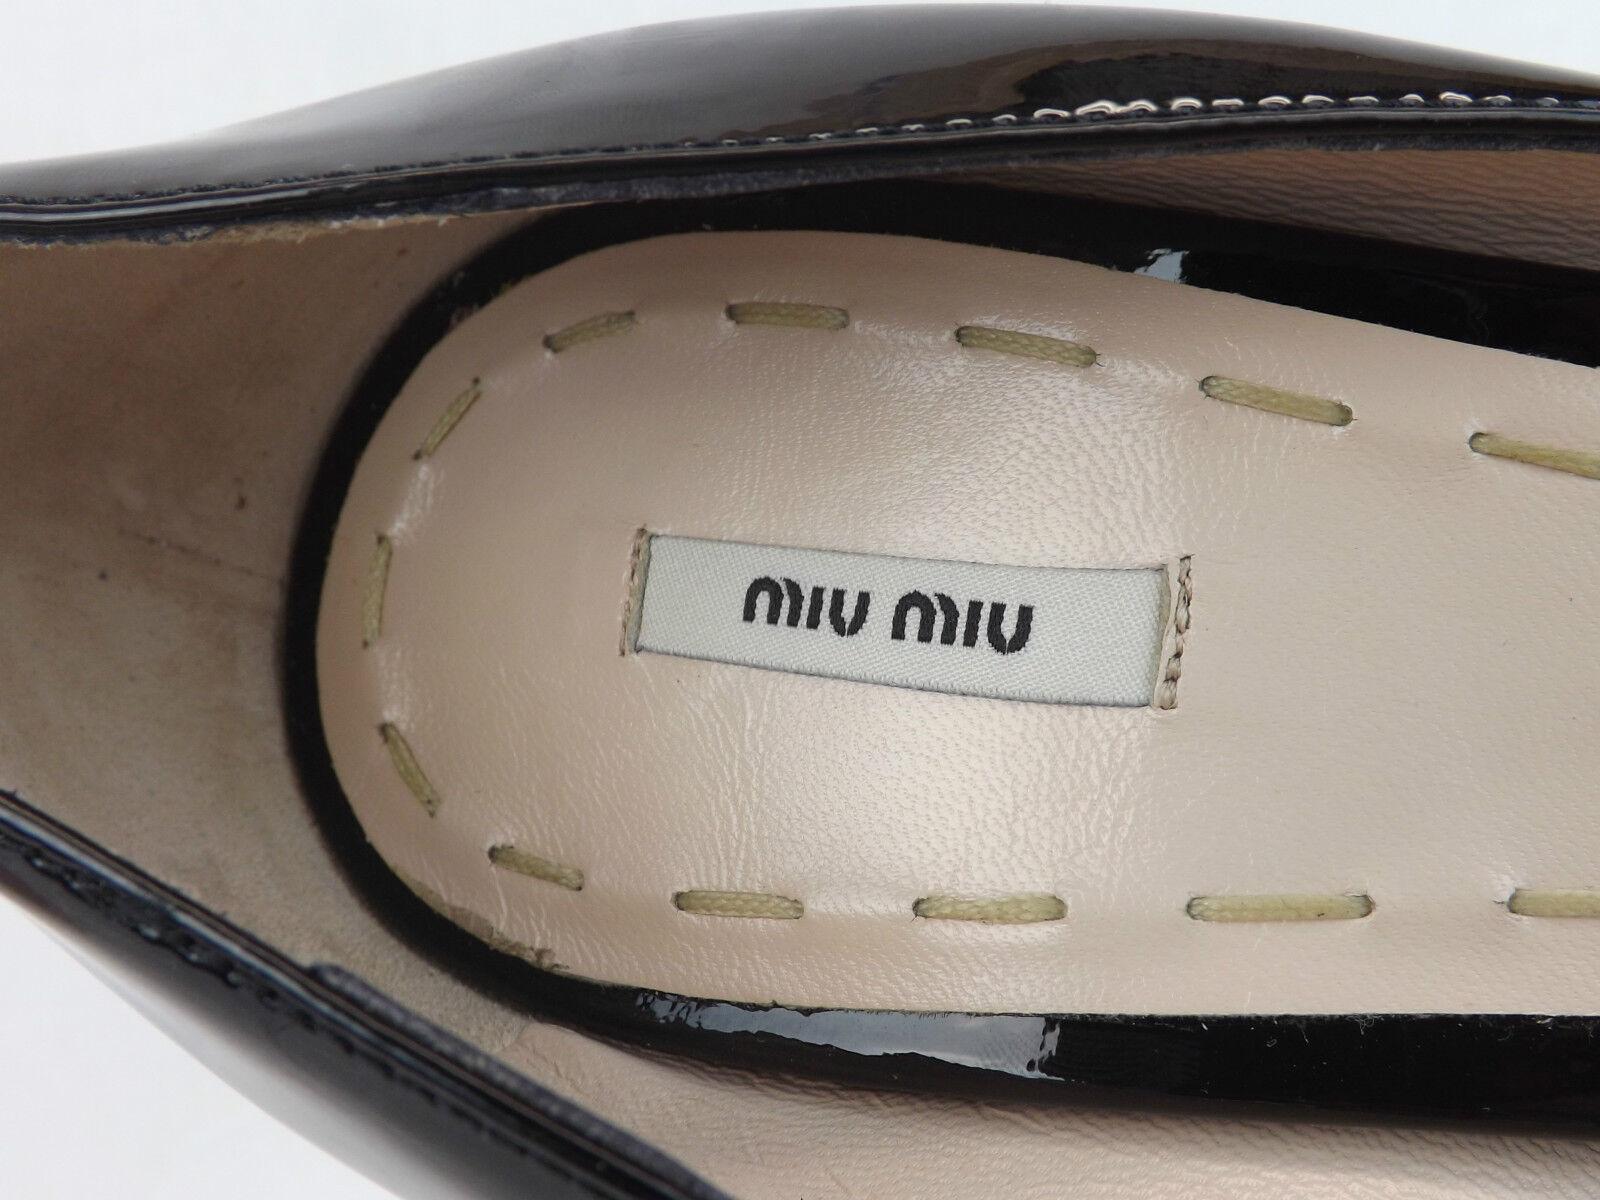 Nuevo En Caja Miu Miu Prada Charol Negro Negro Charol Plataforma Peep Toe bombas de cuello en V 40 a6344f